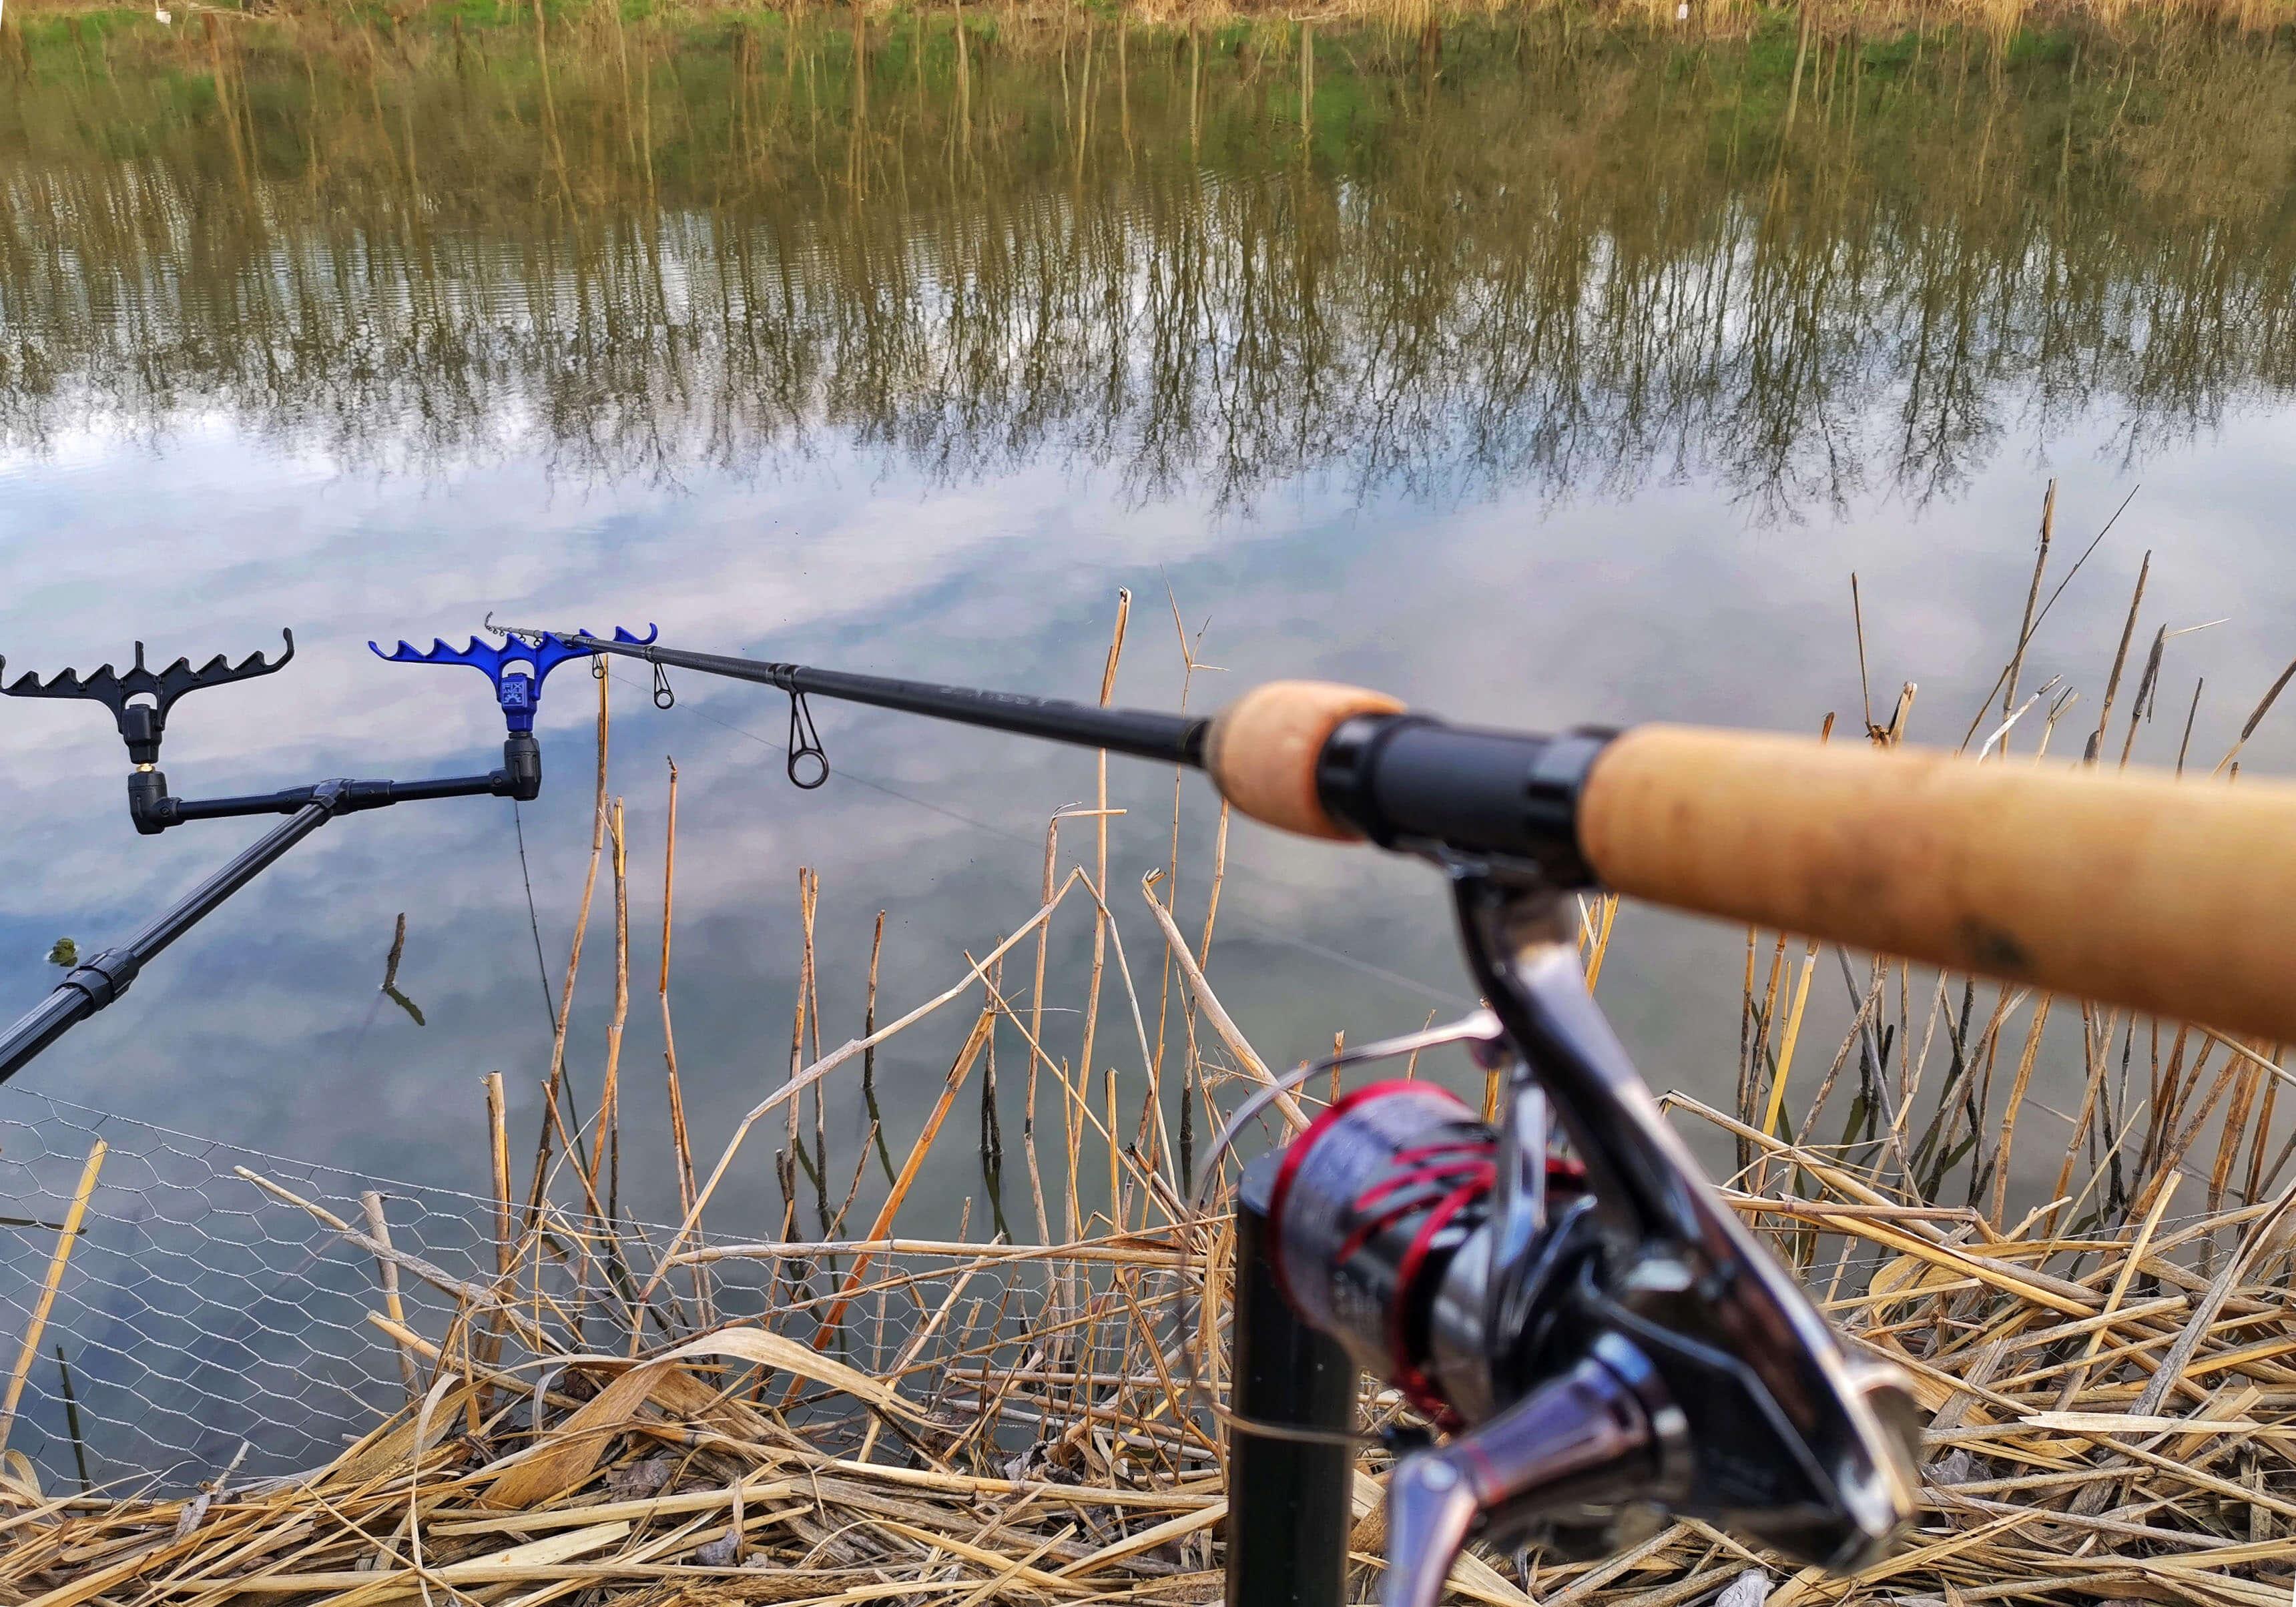 lanseta in asteptare la pescuit la feeder pe Dyno Lake